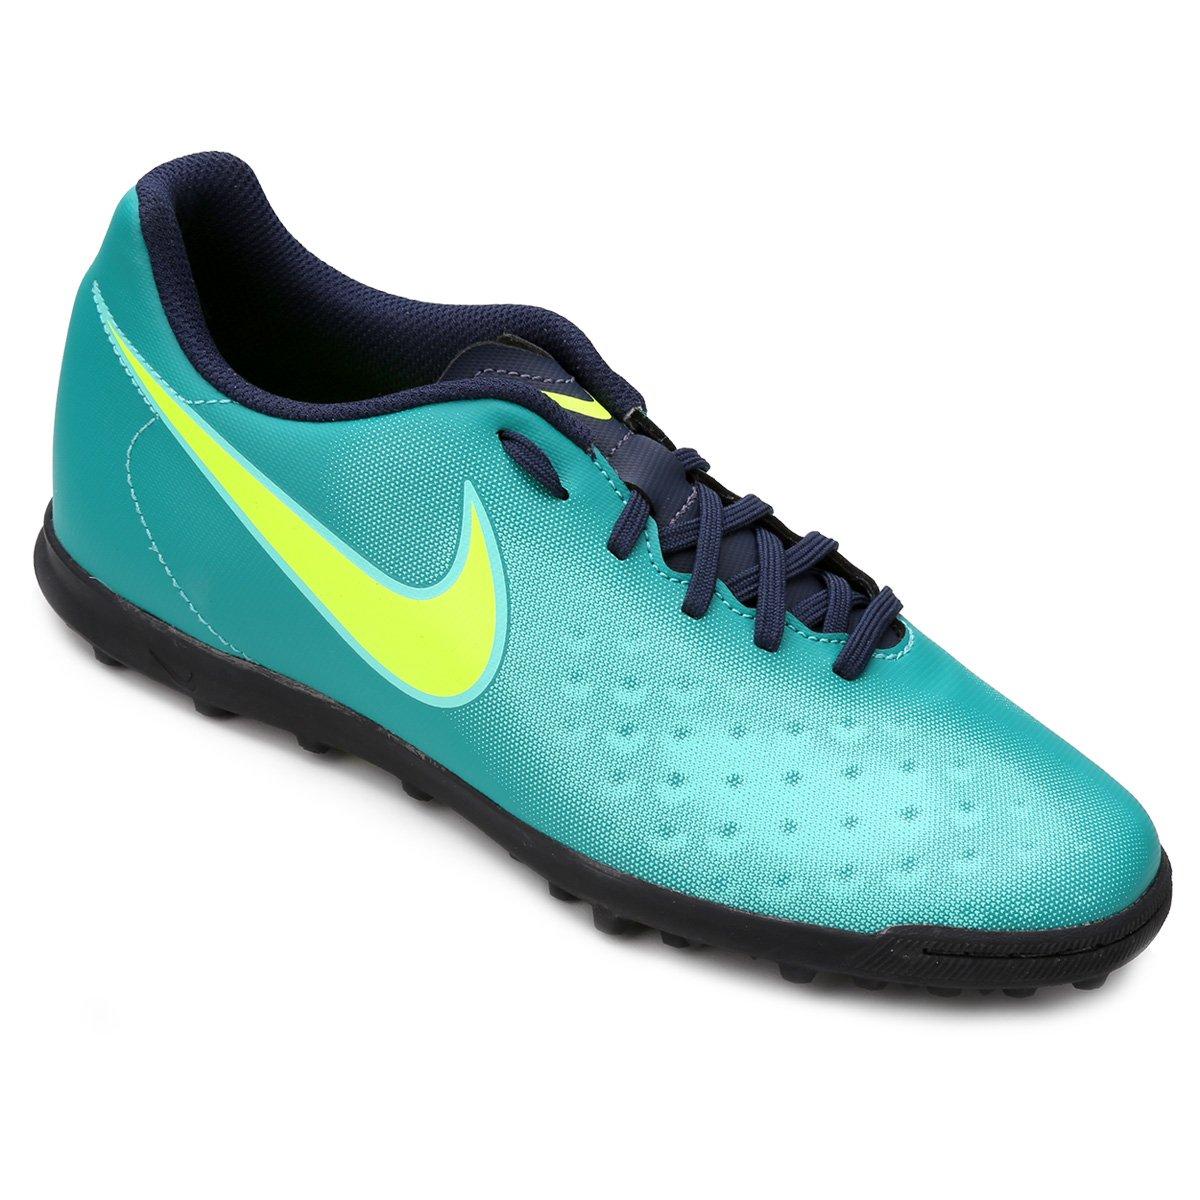 12321762fc960 Chuteira Society Nike Magista Ola II TF - Compre Agora